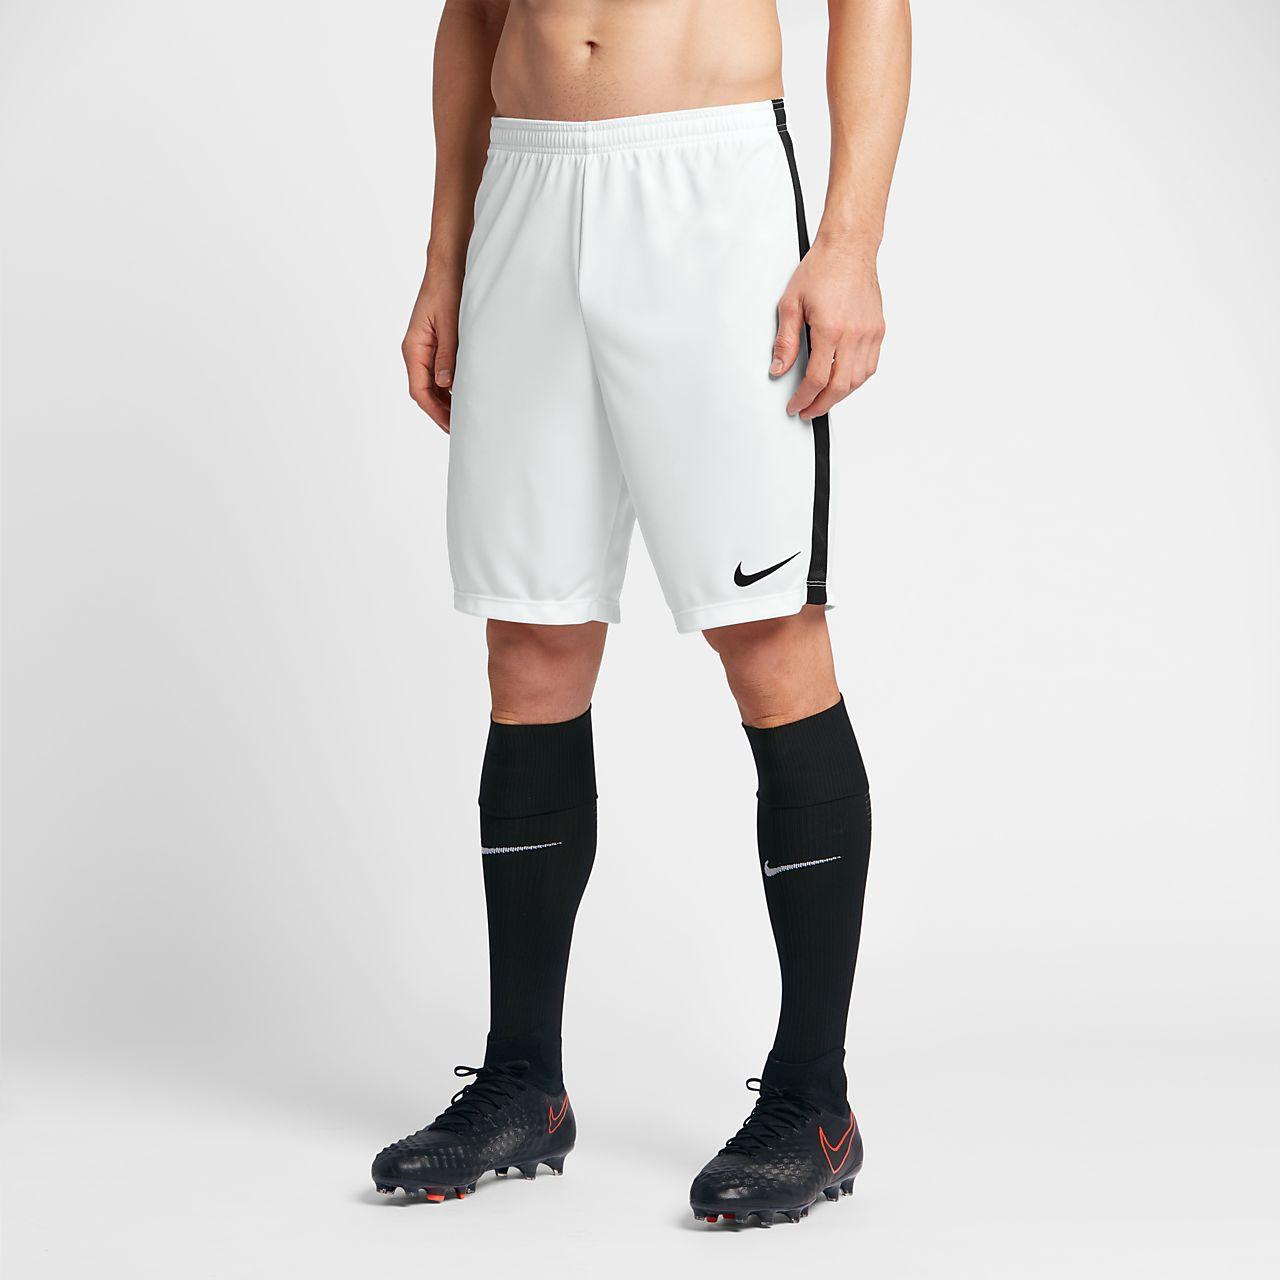 Nike Chaussettes Hommes Dri Fit Running Short Blanc style de mode HEvW2V